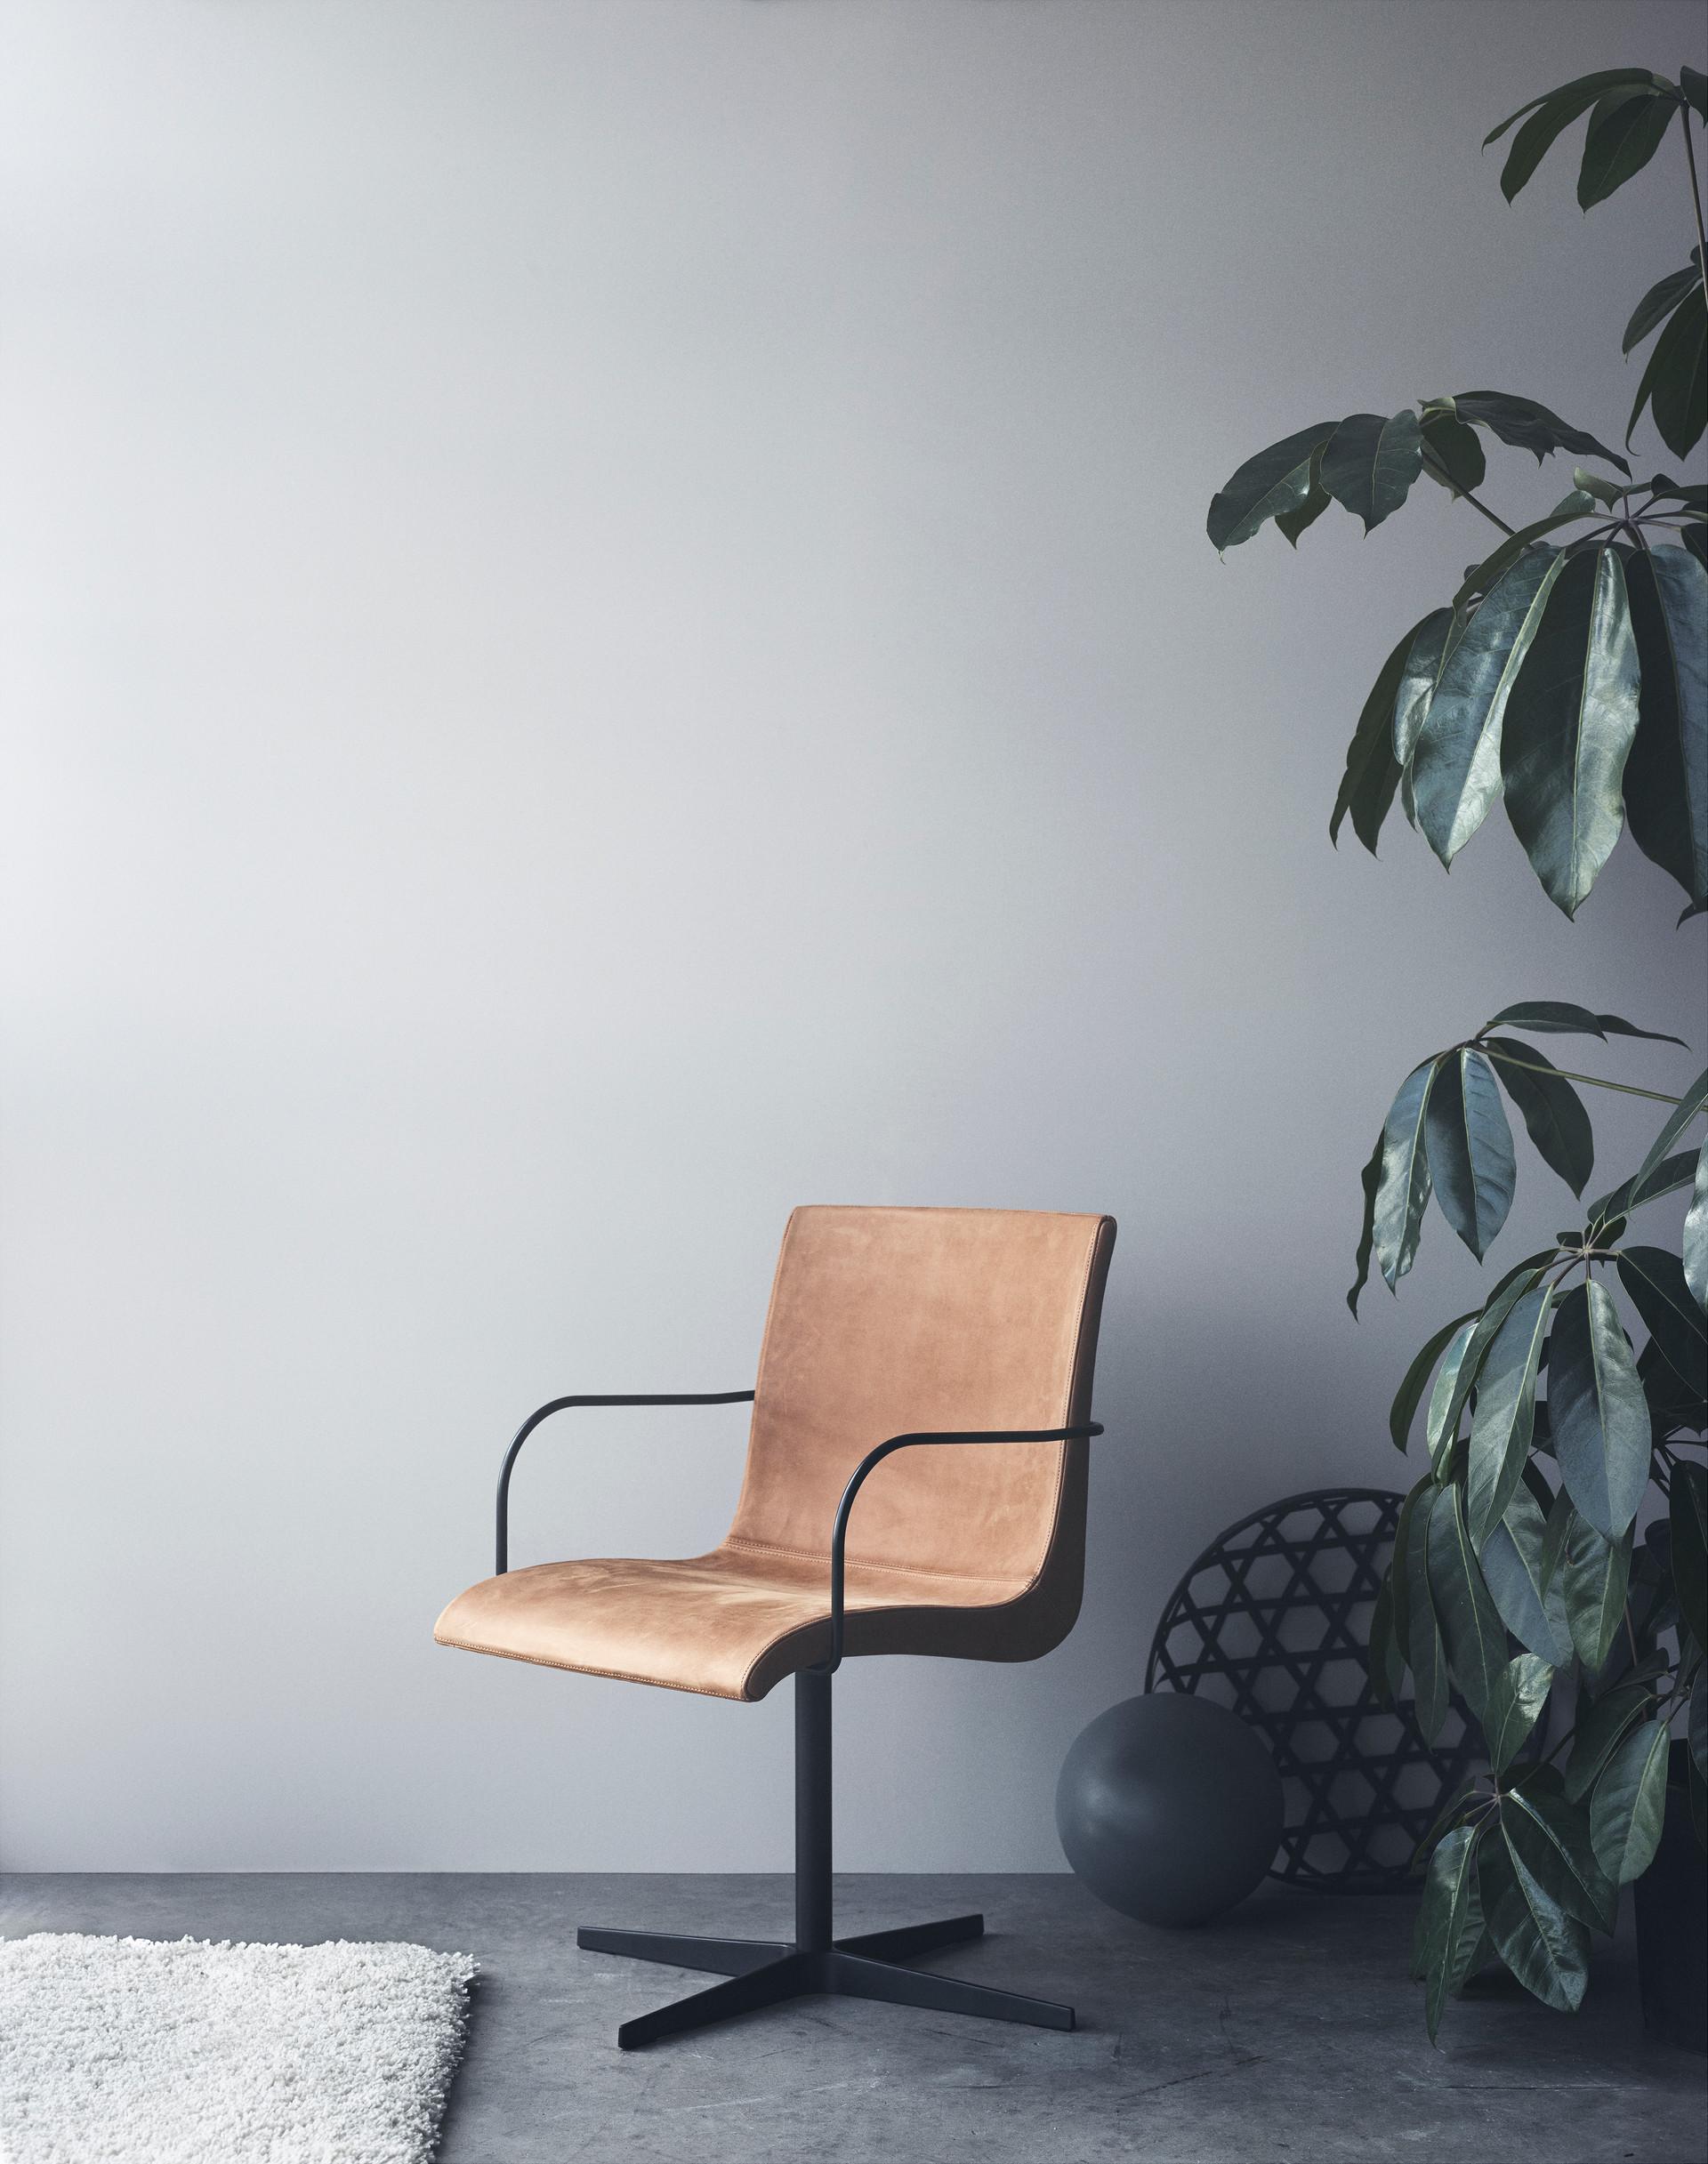 erik_bagger_furniture_Michael_Rygaard1.jpg